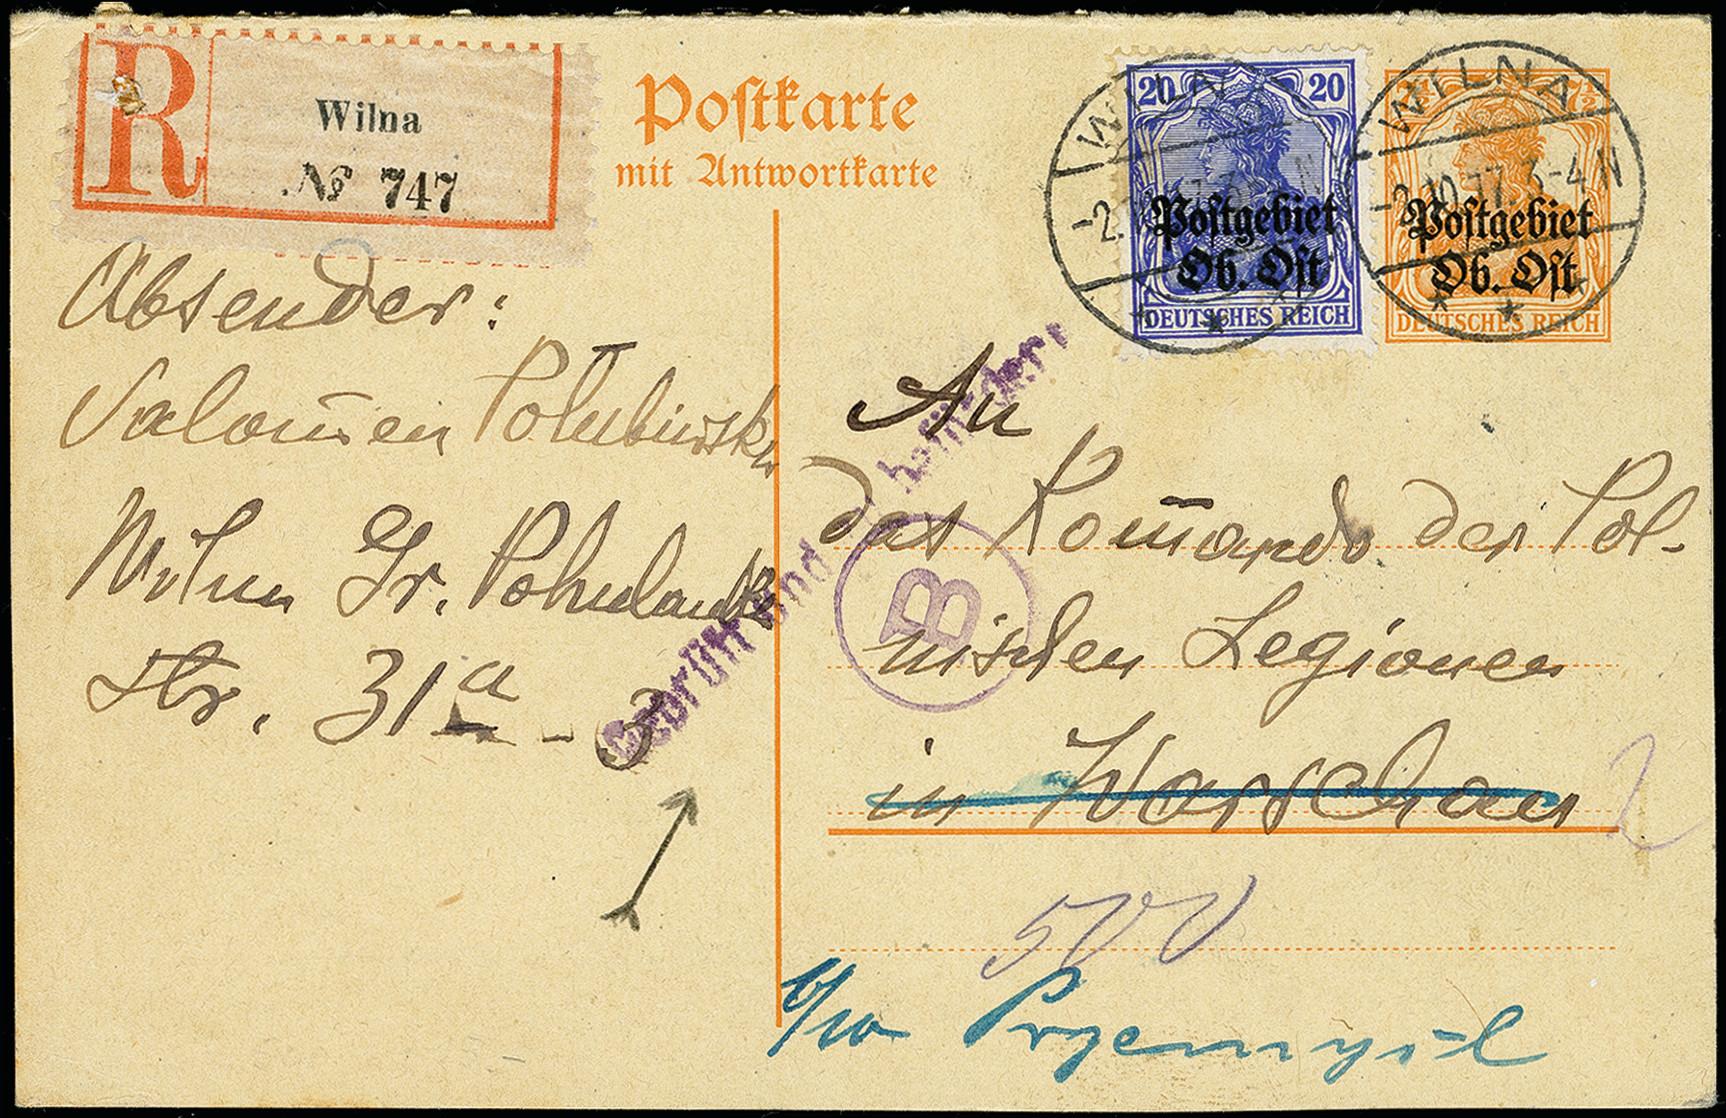 Lot 116 - europe Central Lithuania, Ober Ost -  Heinrich Koehler Auktionen 373rd Heinrich Köhler auction - Day 1